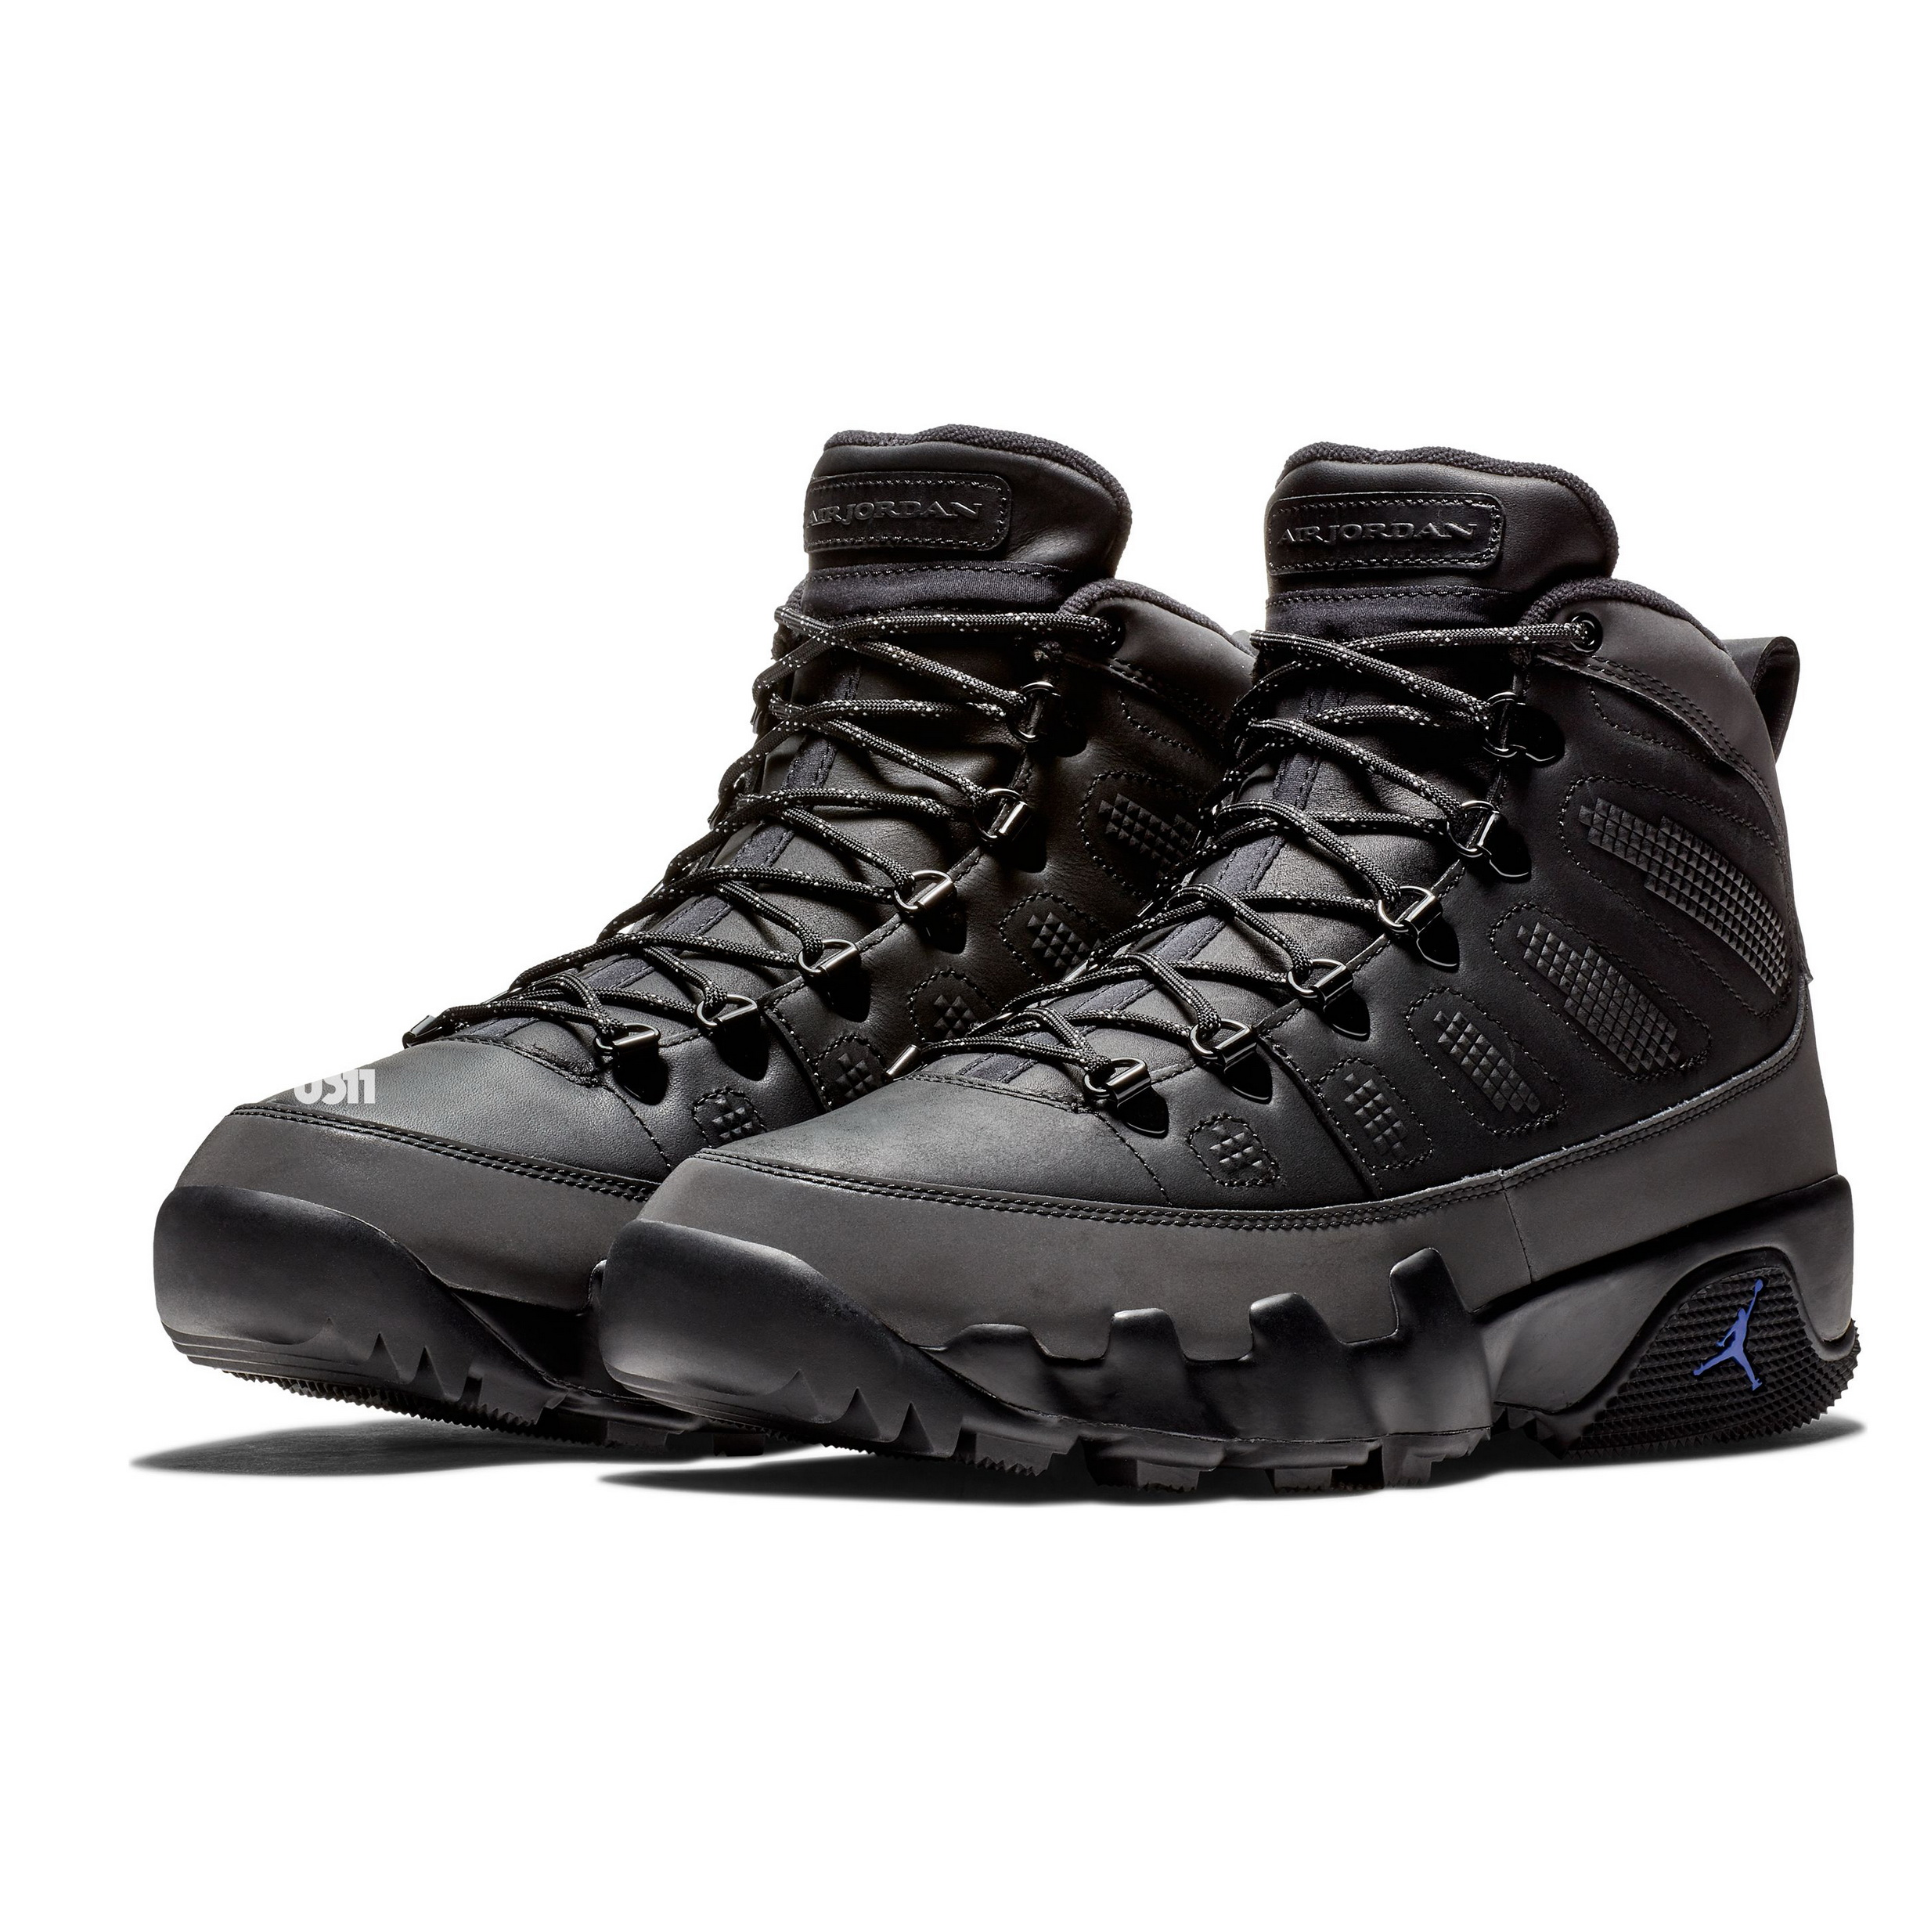 098bf45dd20 AJ9-Boot-ORLMAGIC1 - WearTesters